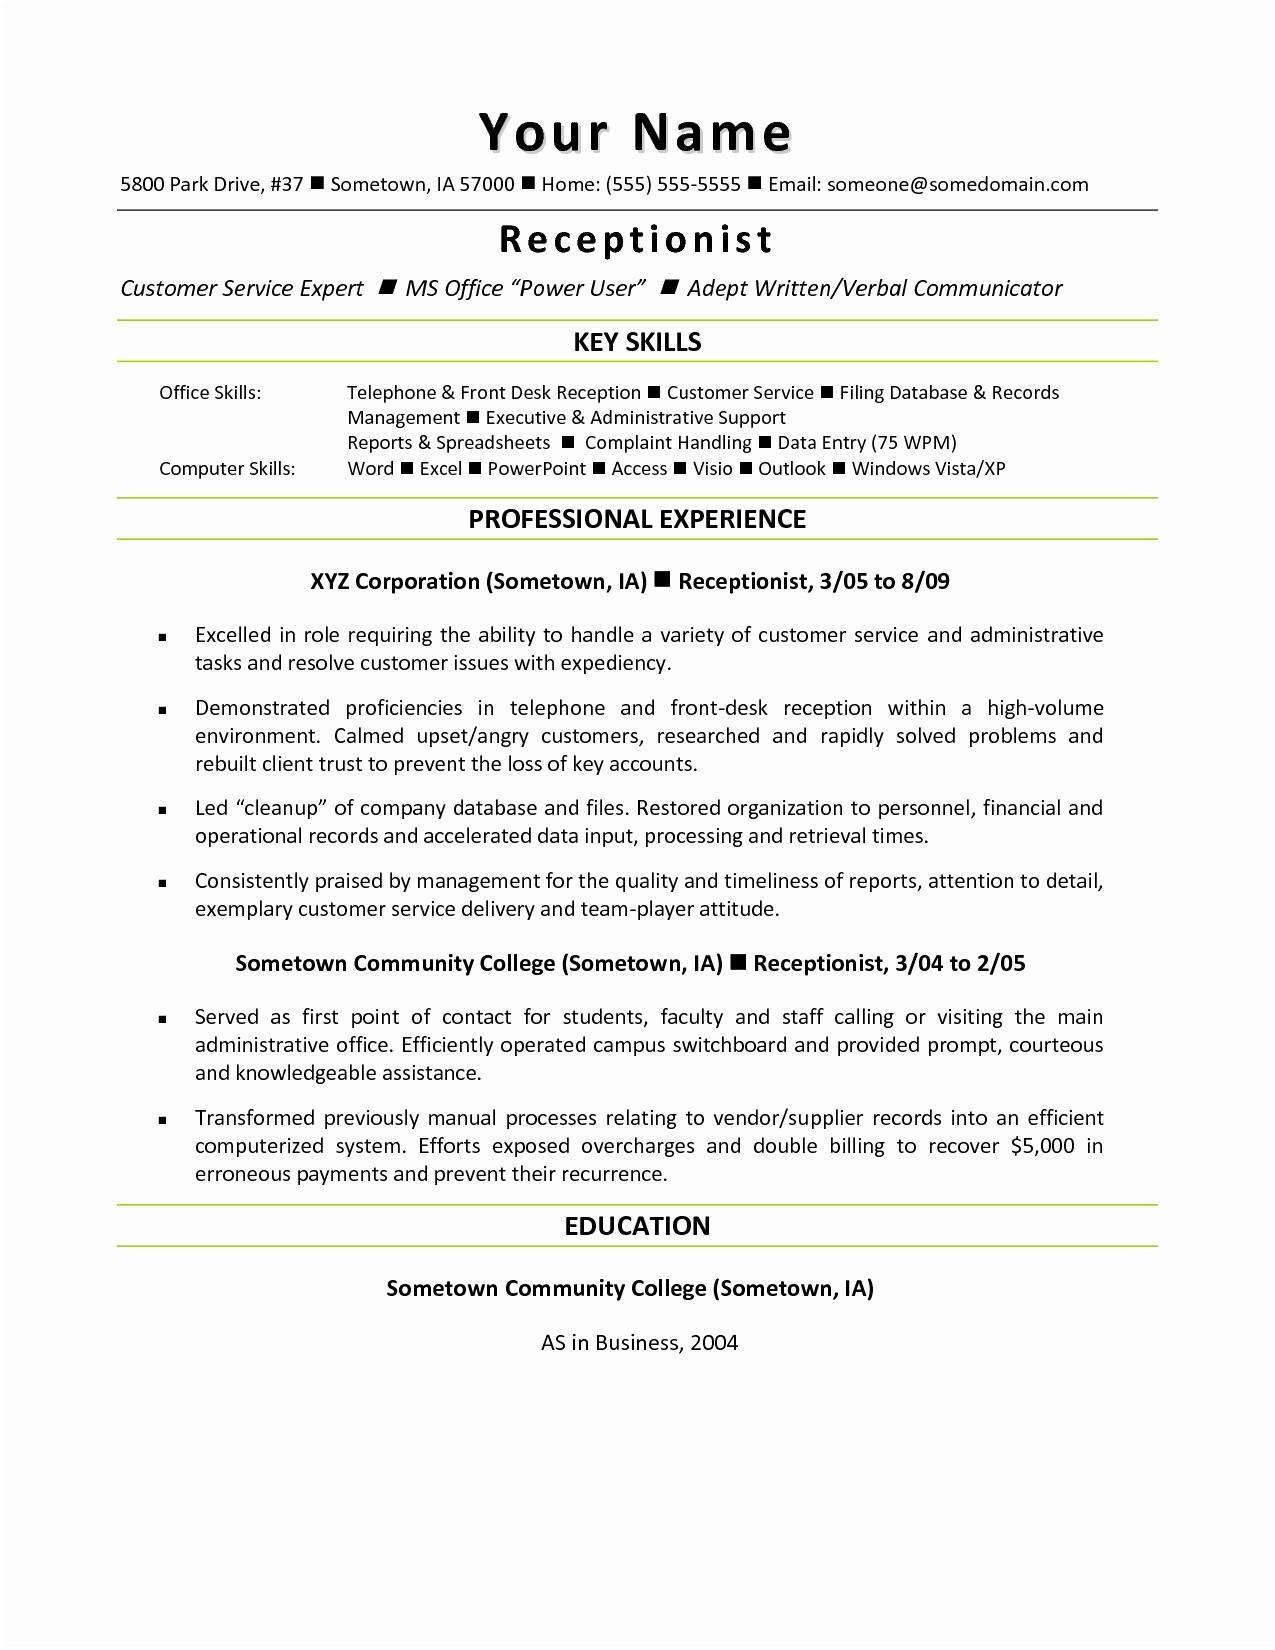 Resume Cover Letter Template Word - Resume Microsoft Word Fresh Resume Mail format Sample Fresh